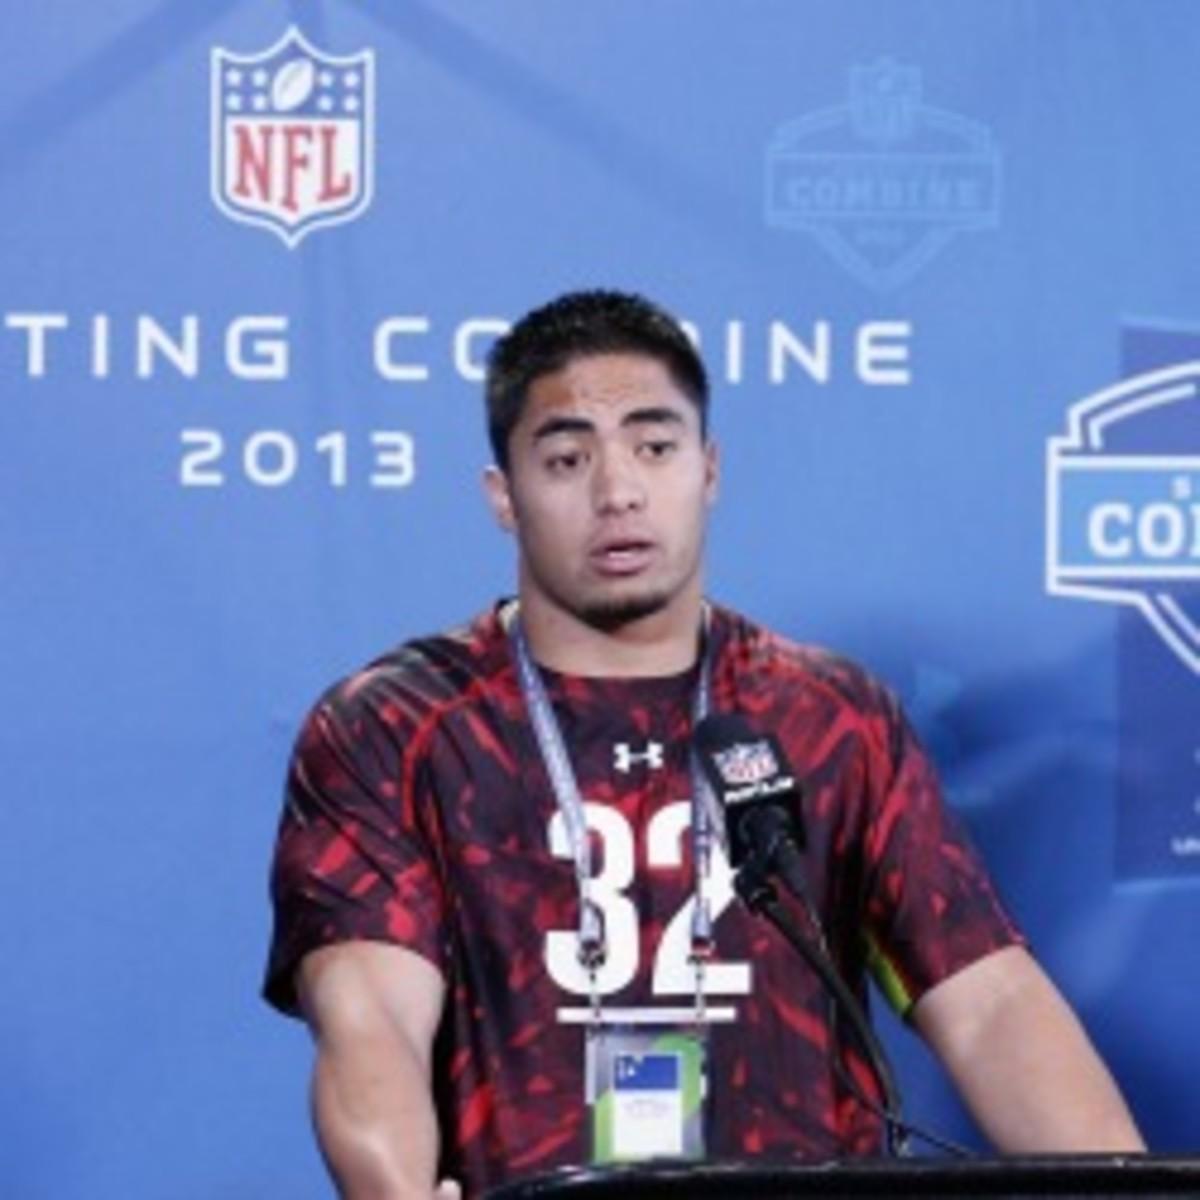 Manti Te'o ran a 4.81 40-yard dash at the combine. (Joe Robbins/Getty Images)